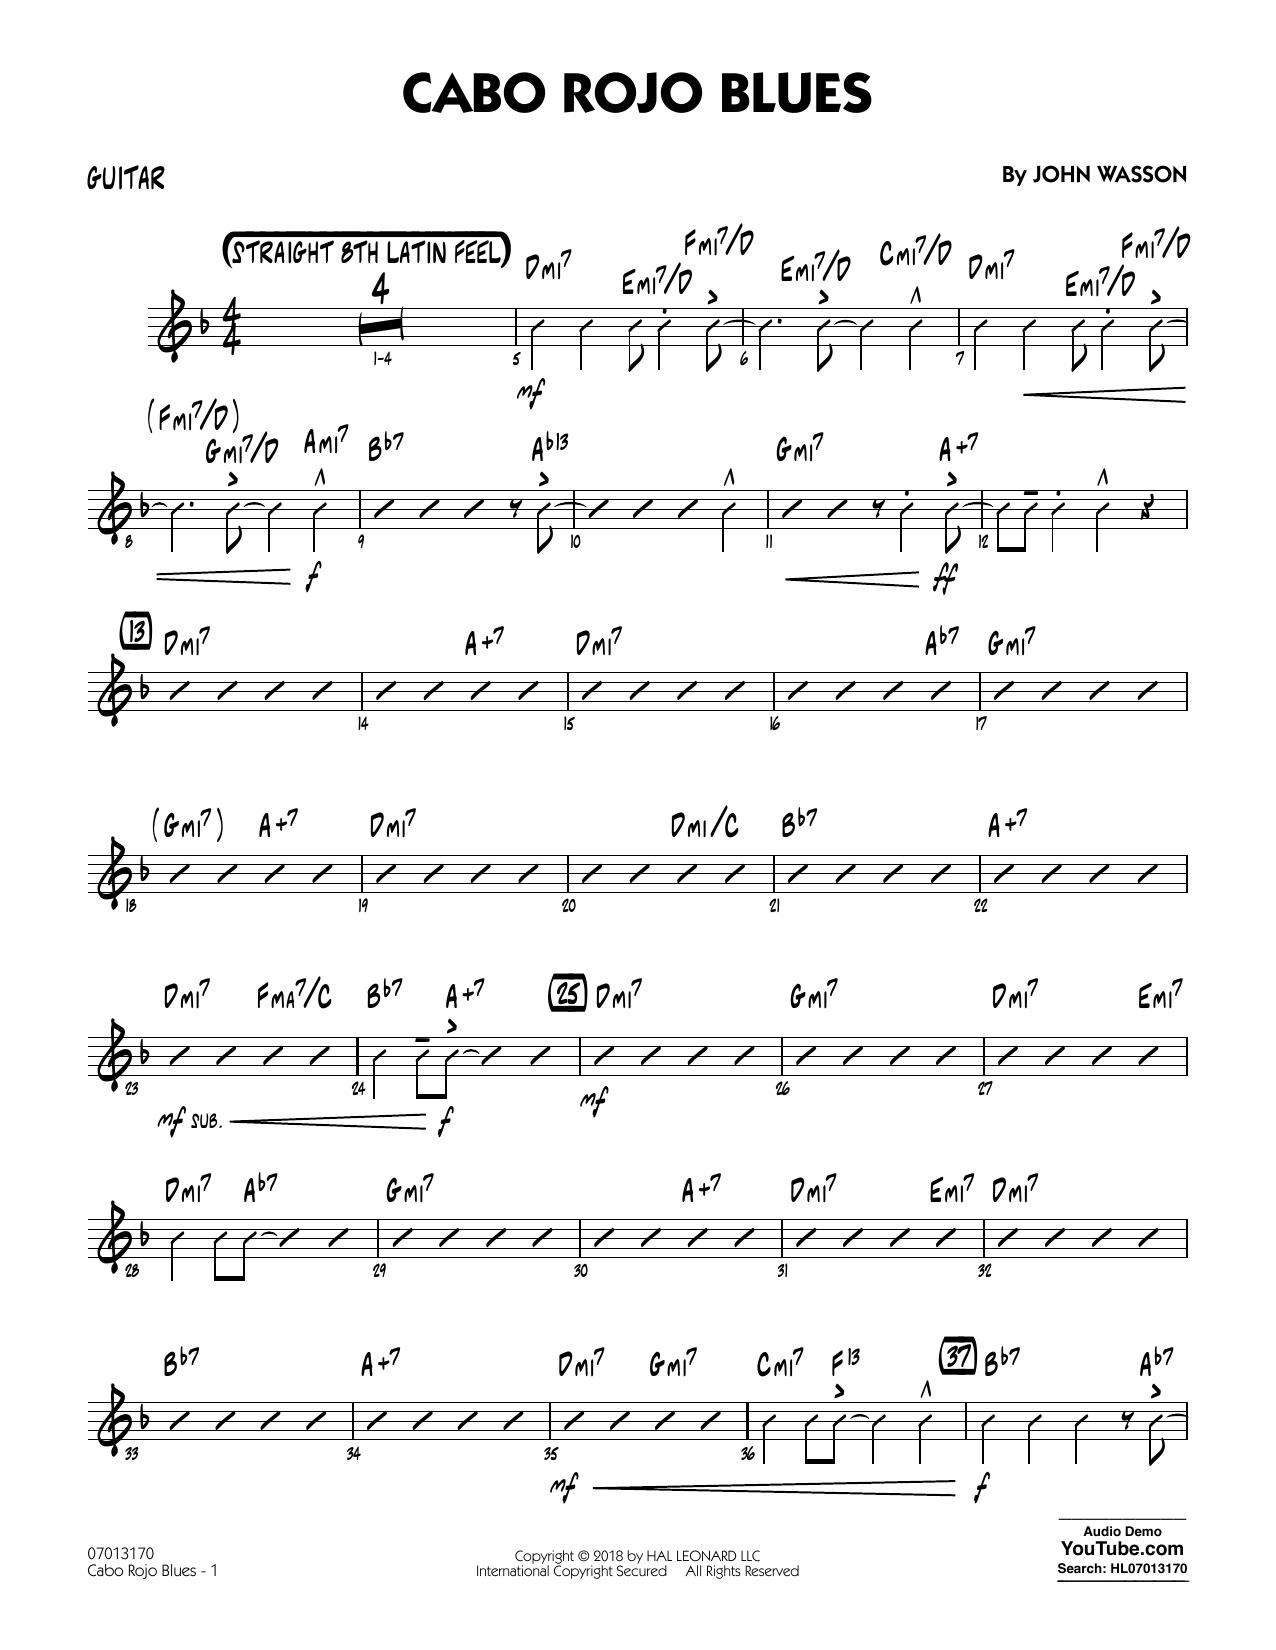 John Wasson Cabo Rojo Blues - Guitar sheet music notes and chords. Download Printable PDF.